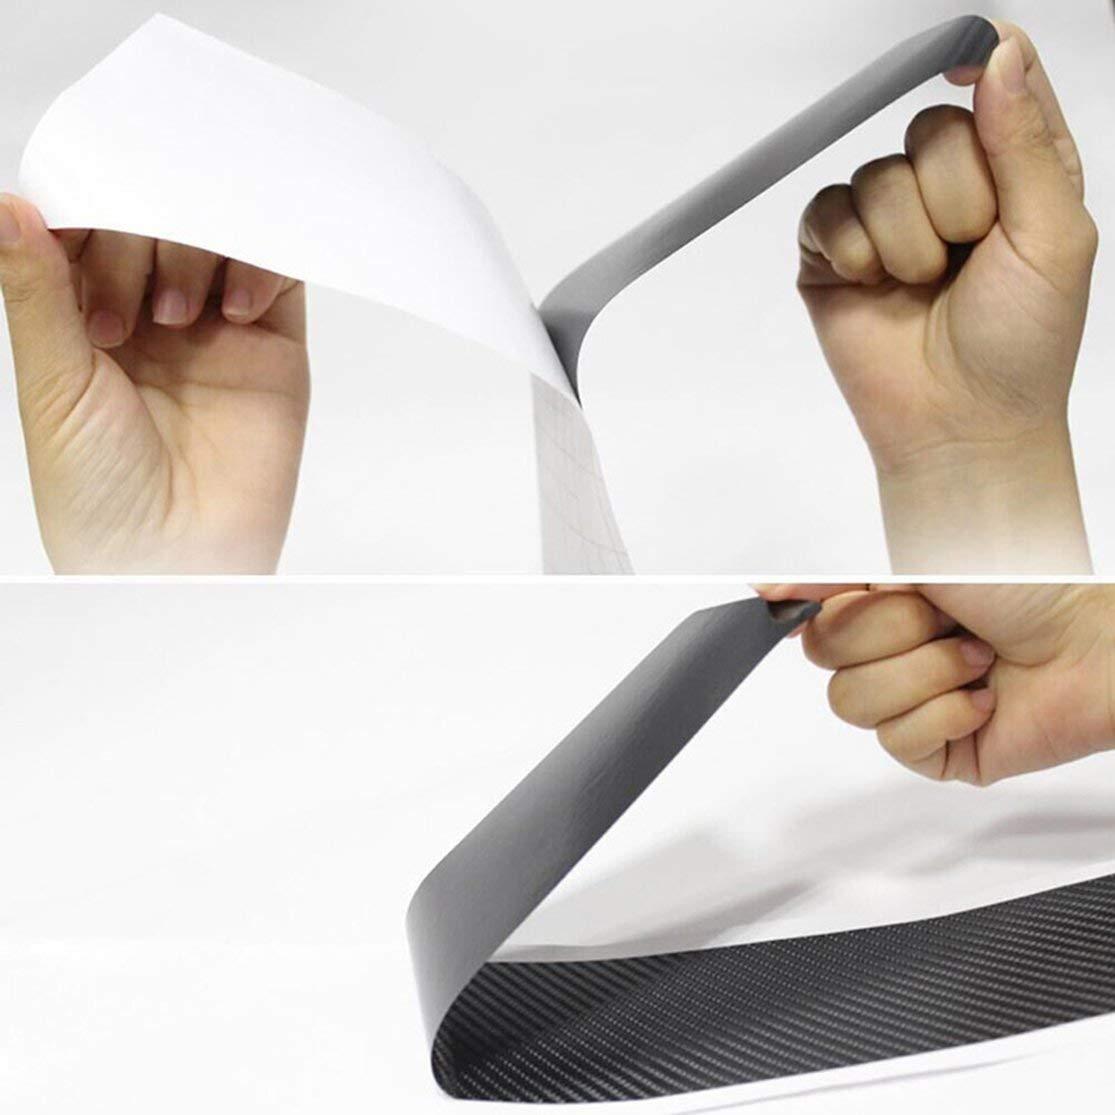 LouiseEvel215 Car Door Sill Scuff Cover Protect Sticker Car Door Sill Scuff Guard Pedal Protector Scuff Plate Sticker with Scraper